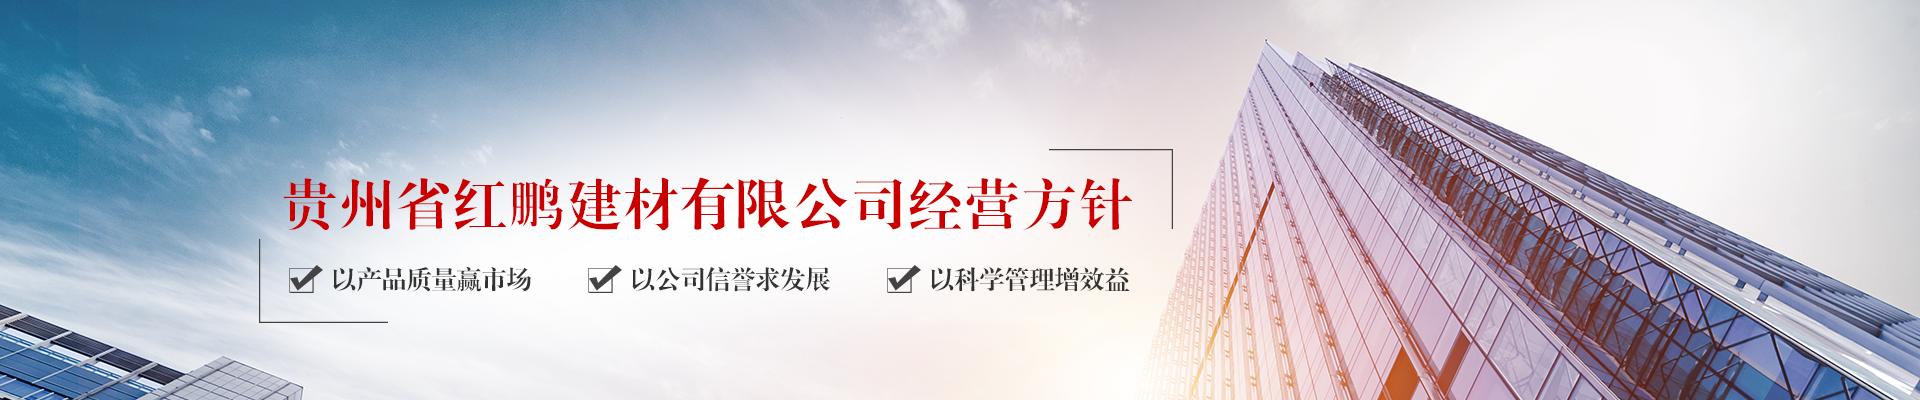 http://www.gzhpjc.cn/data/upload/202011/20201120091857_225.png